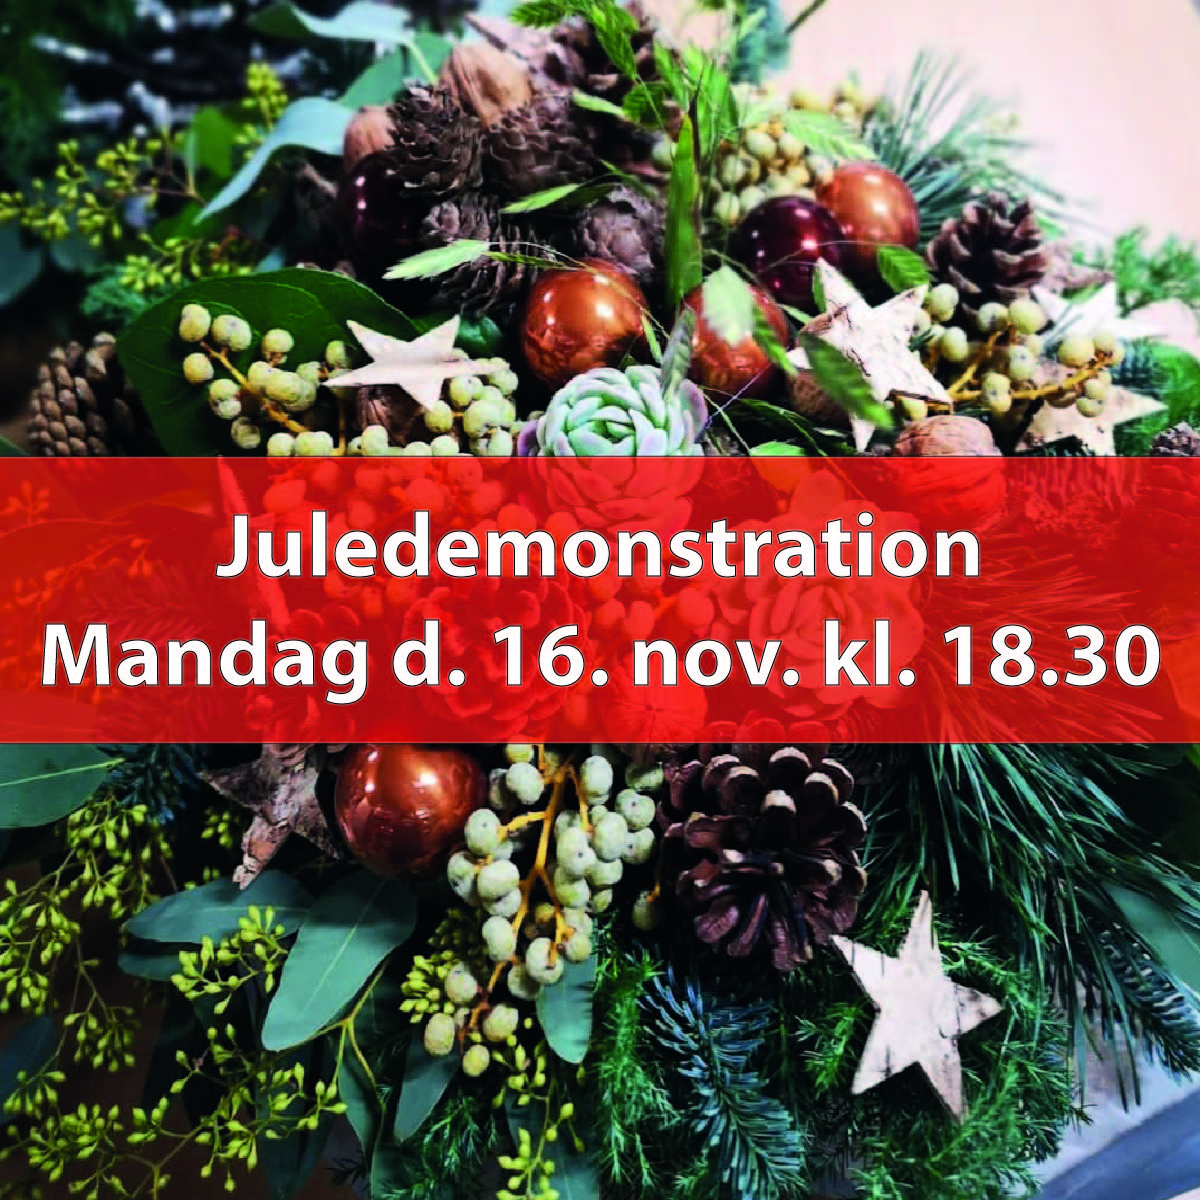 Juledemonstration, Man. d. 16. nov. kl. 18.30